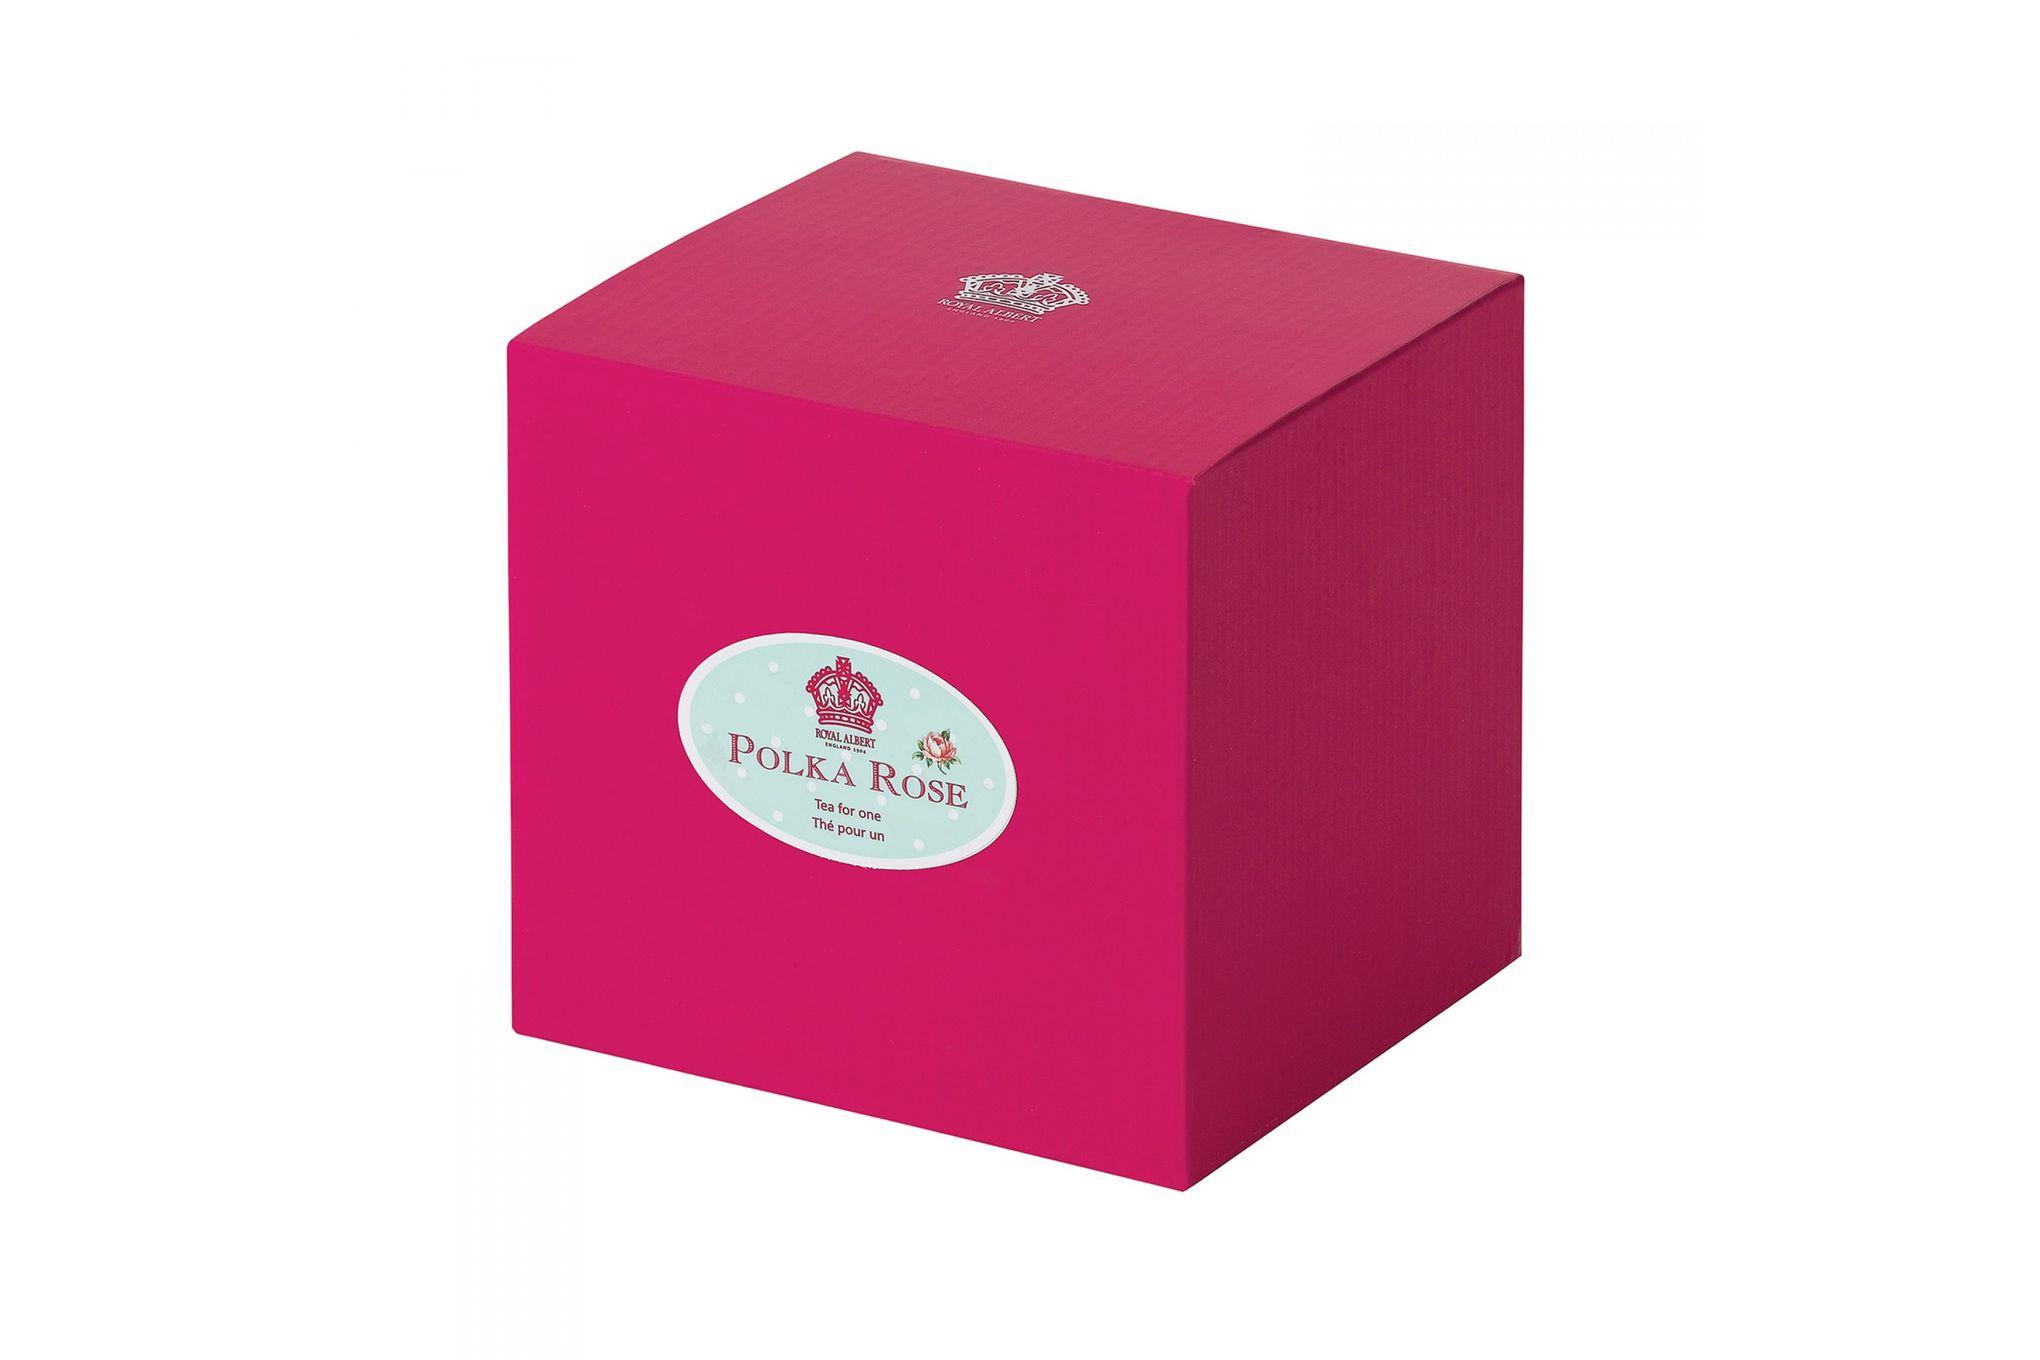 Royal Albert Polka Rose Tea For One thumb 3